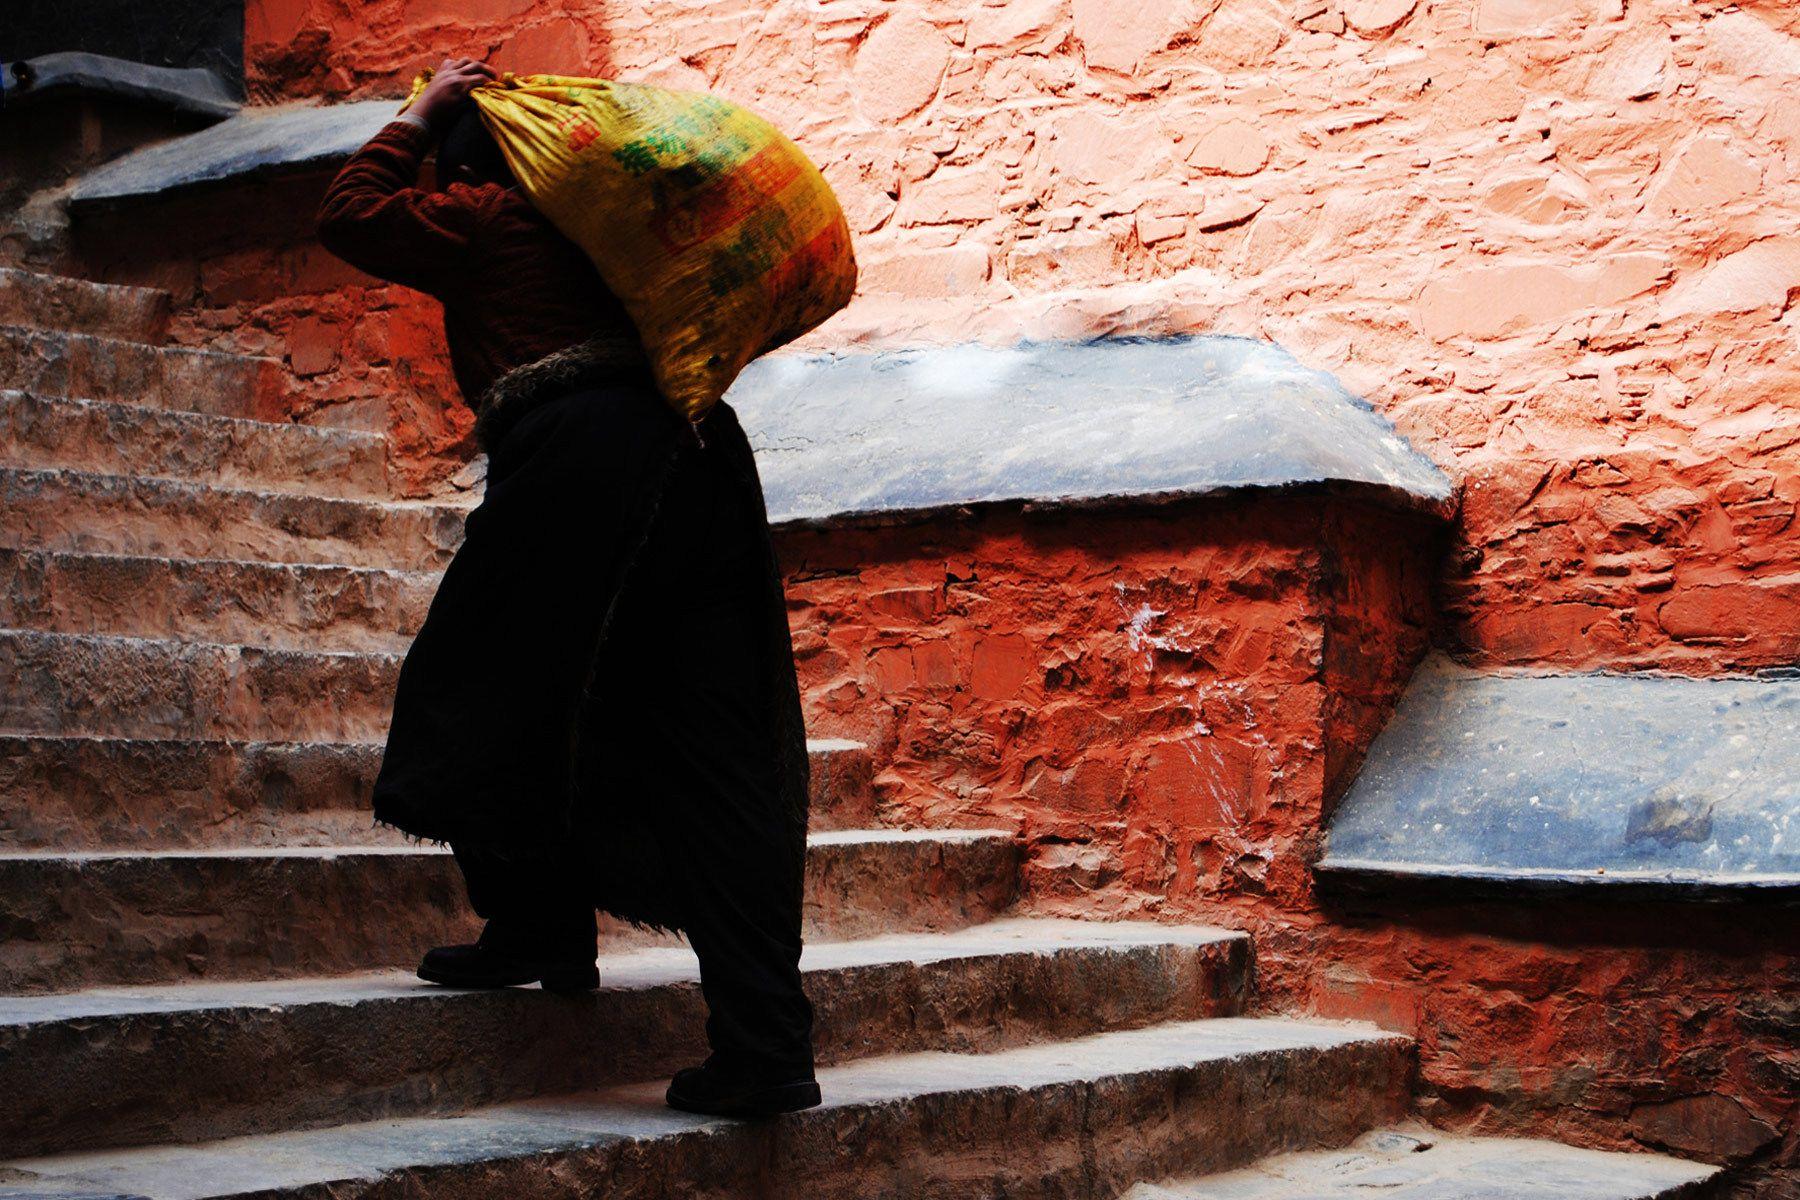 103___tibet_monk_buddhist_buddhism_budista_monje.jpg